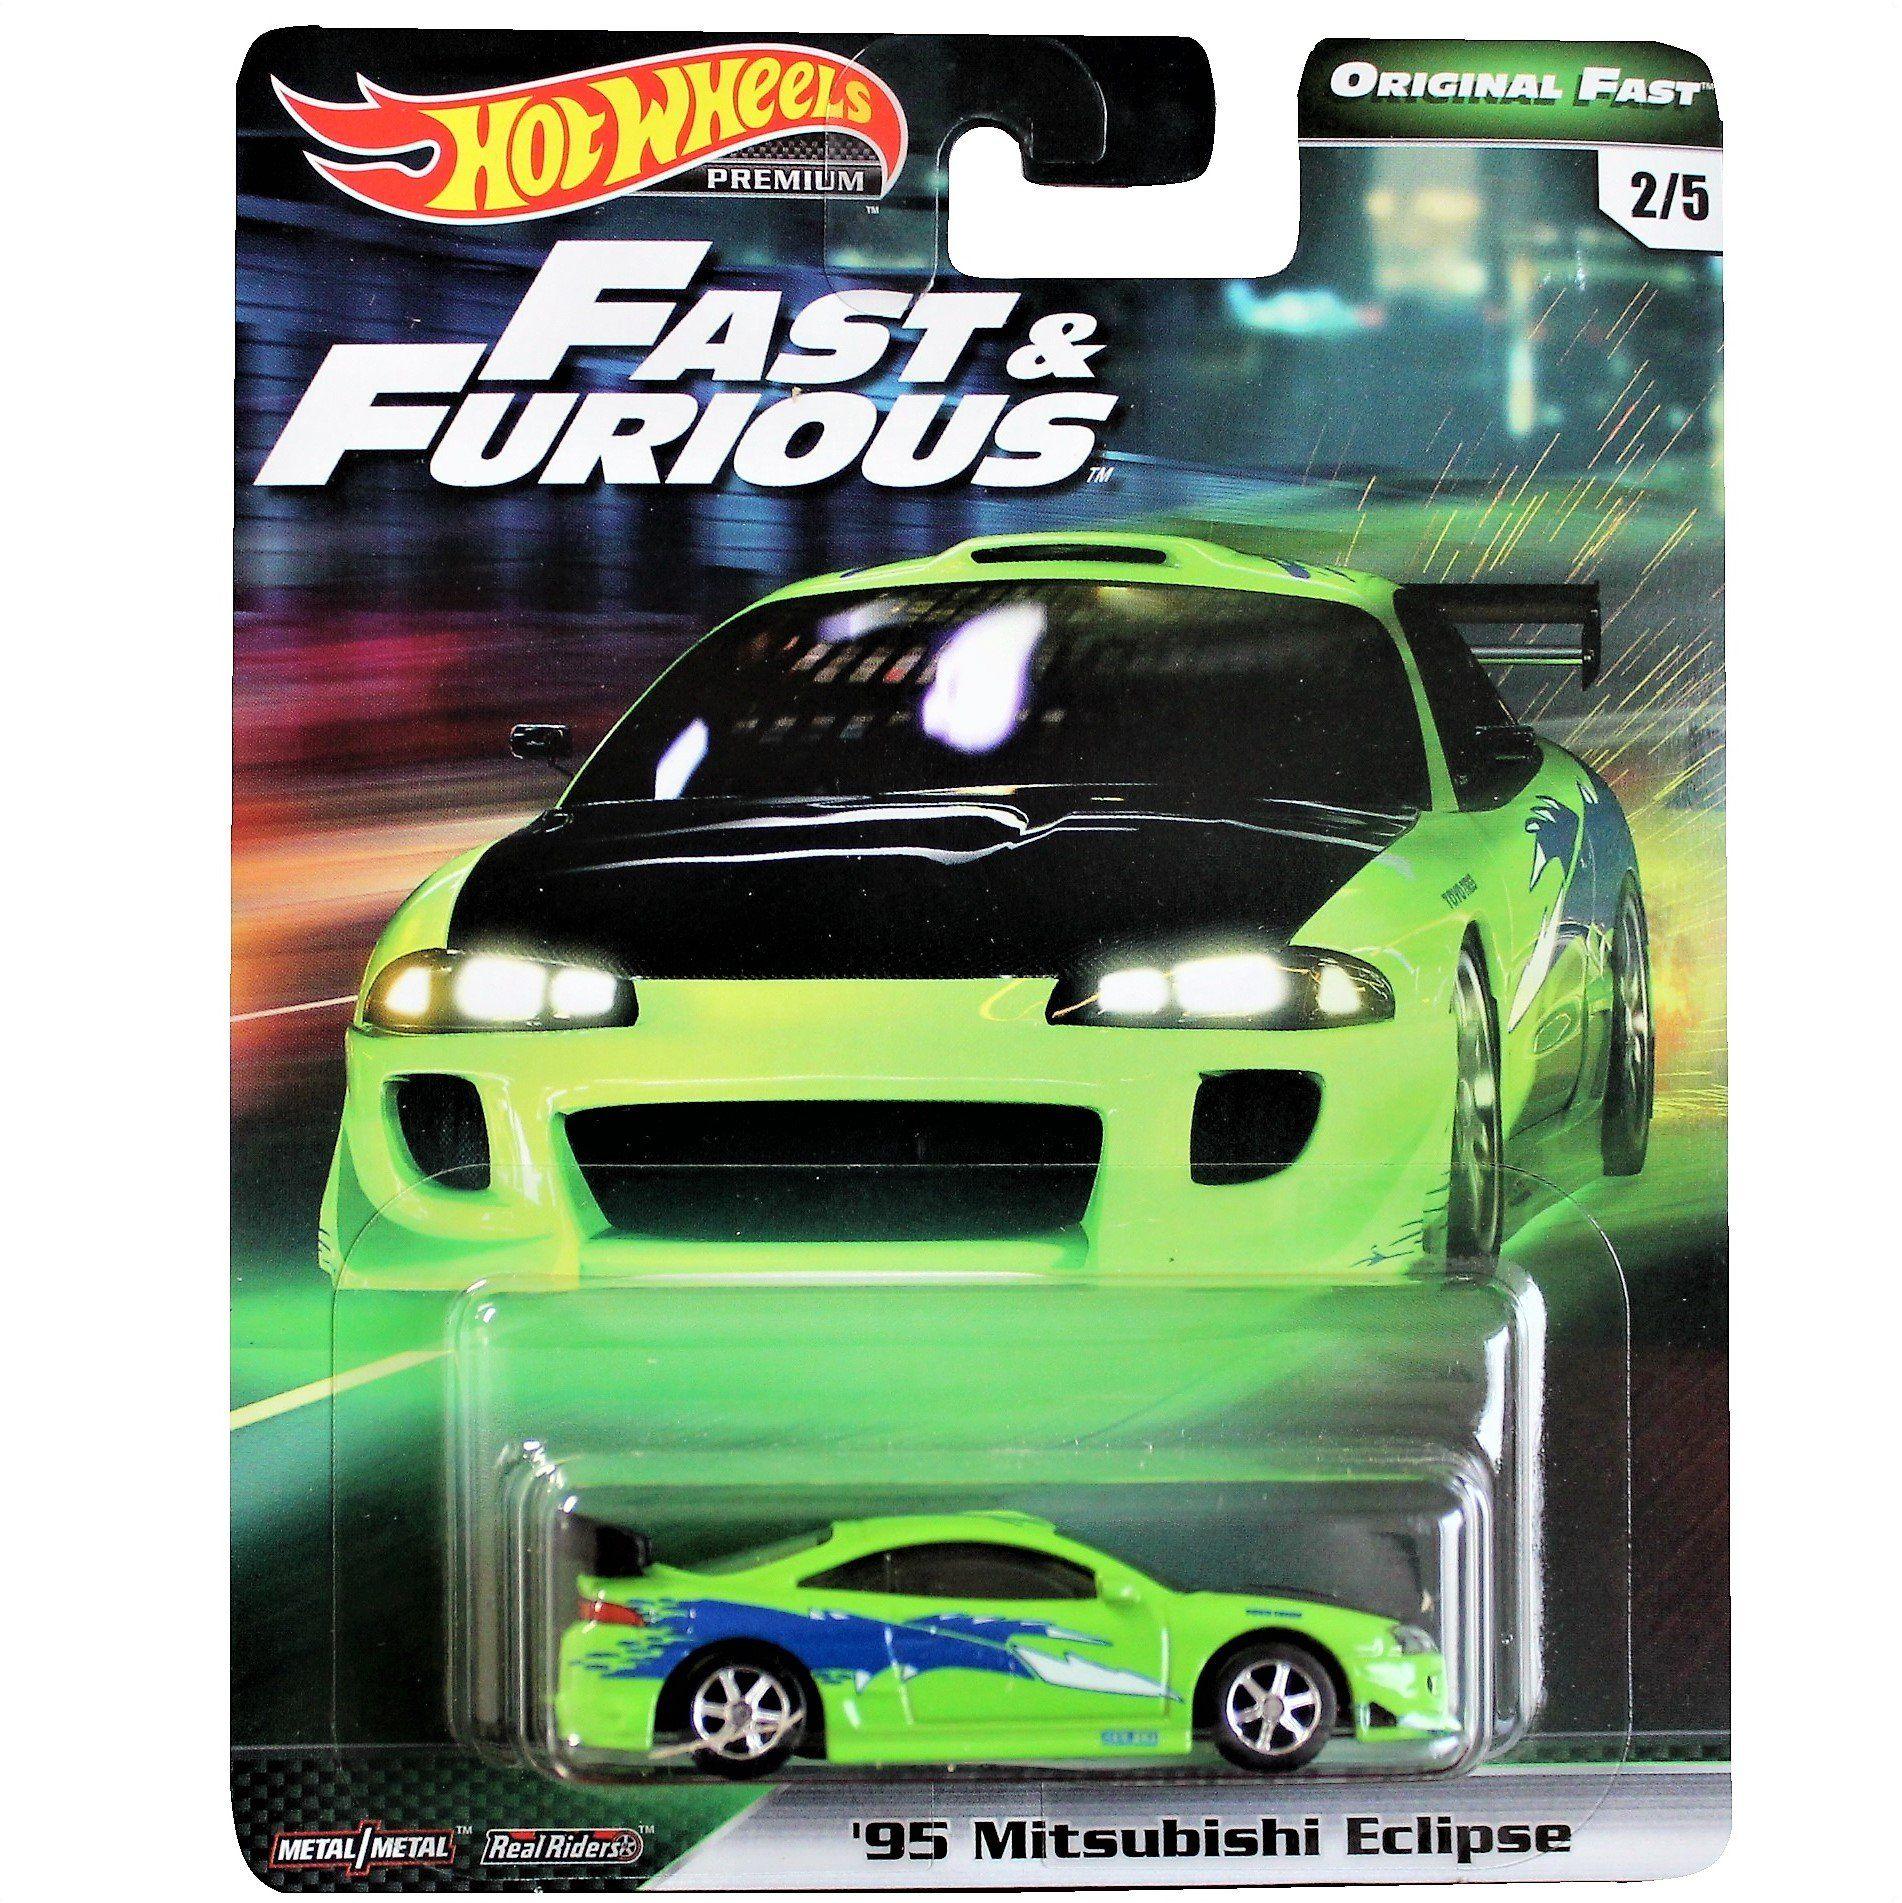 Hot Wheels Fast And Furious Premium Original Fast 2 5 95